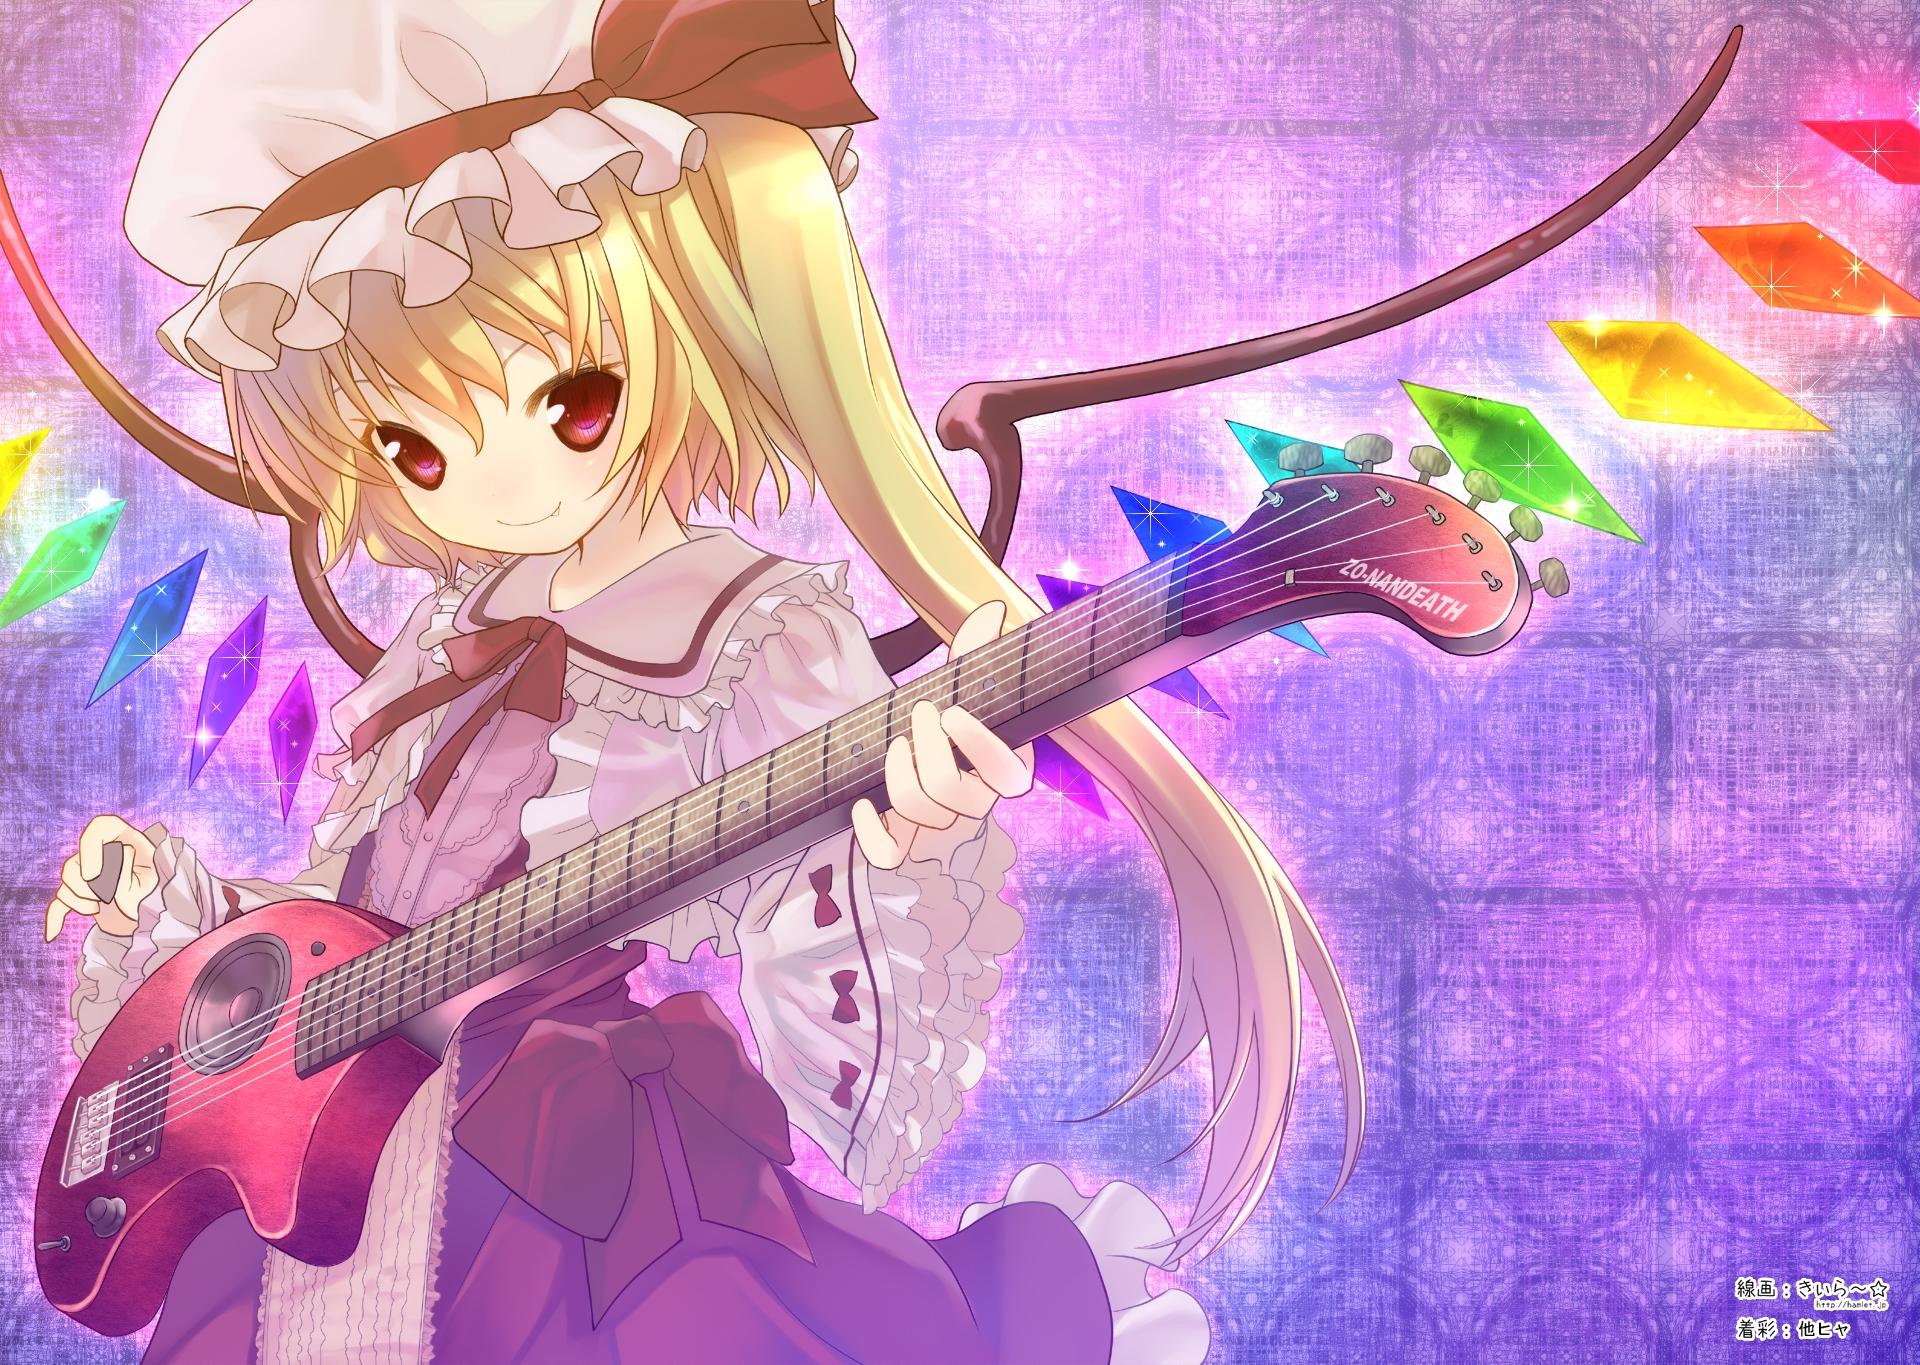 blonde_hair dress fang flandre_scarlet guitar hat instrument long_hair red_eyes ribbons tahya touhou vampire wings